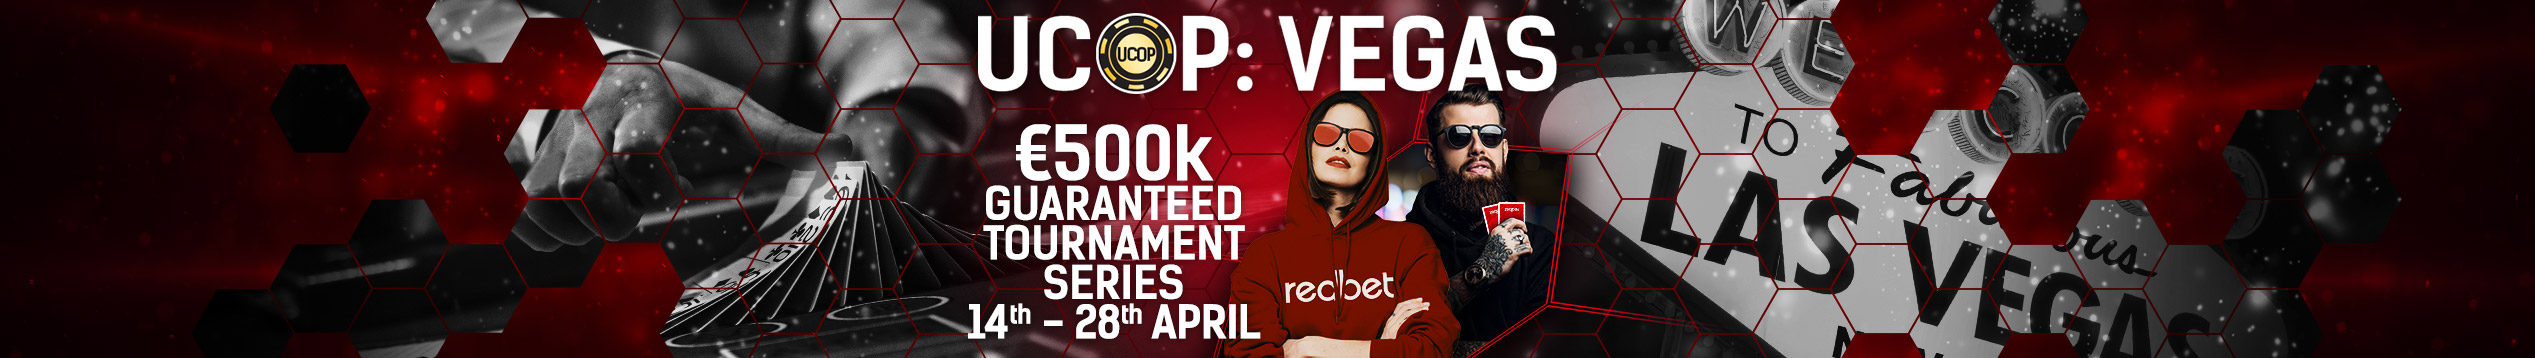 UCOP: Vegas - Trip of a Lifetime!